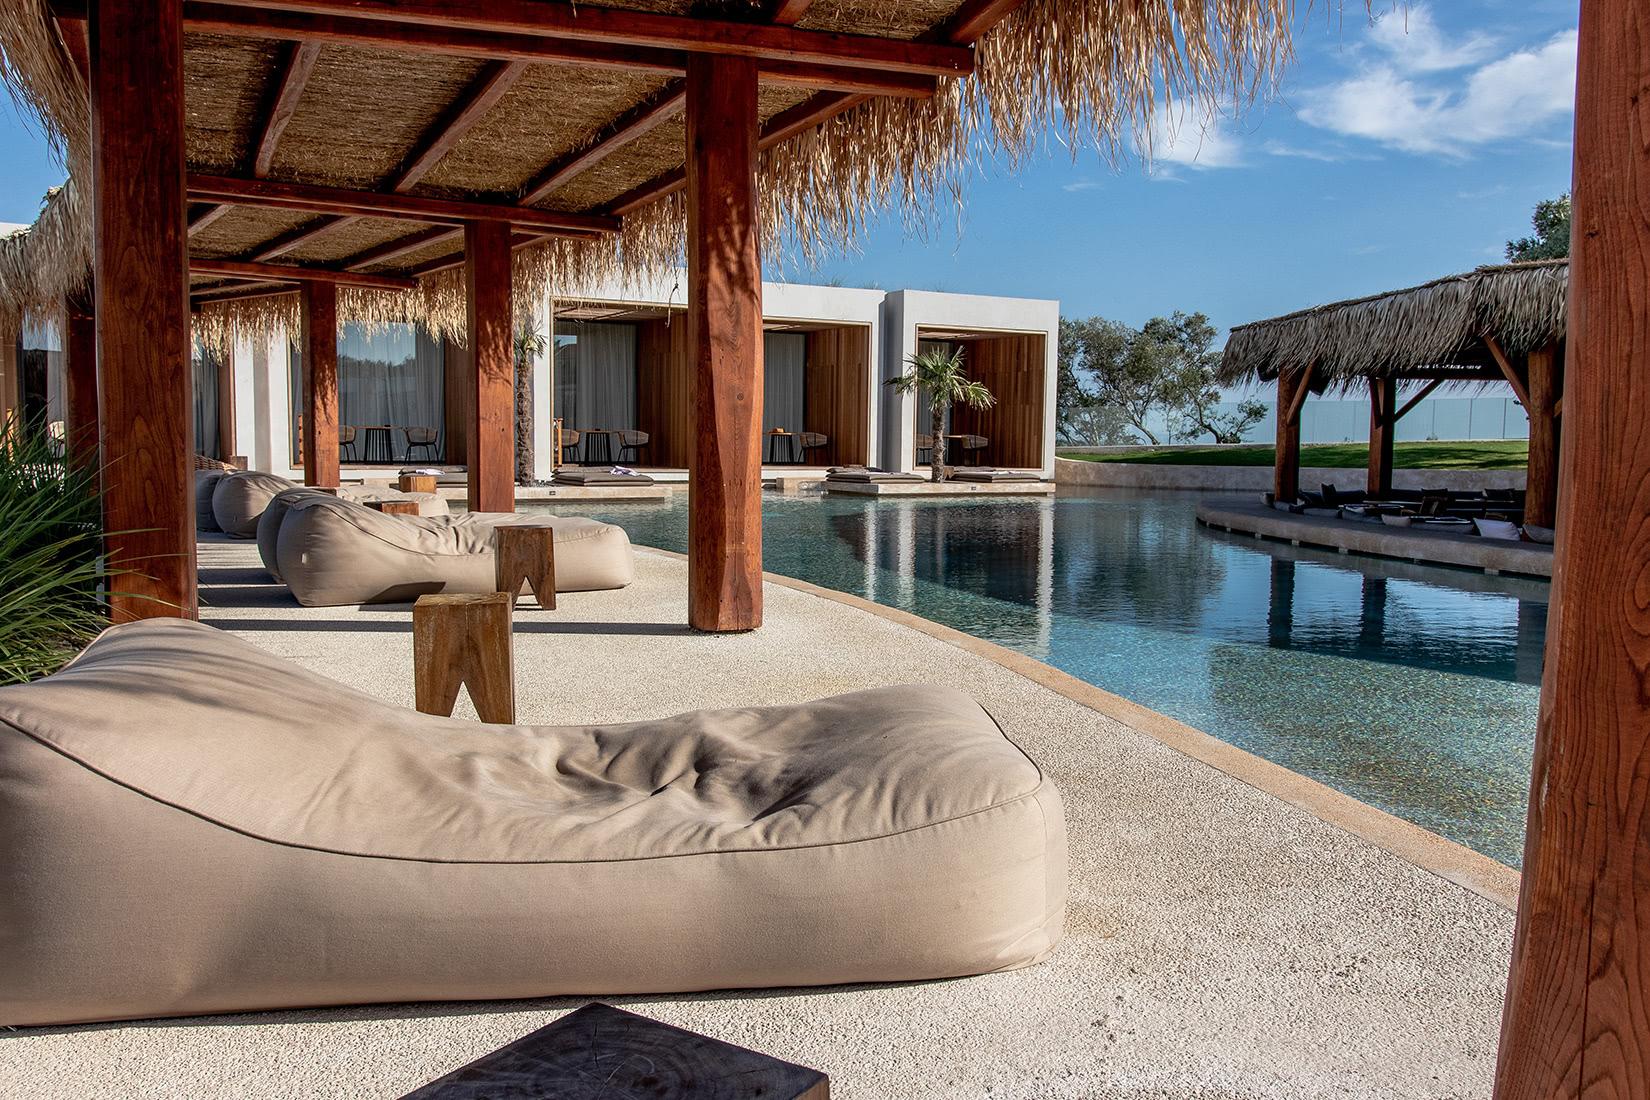 real estate investing greece oceanview properties dream estates advisor luxe digital